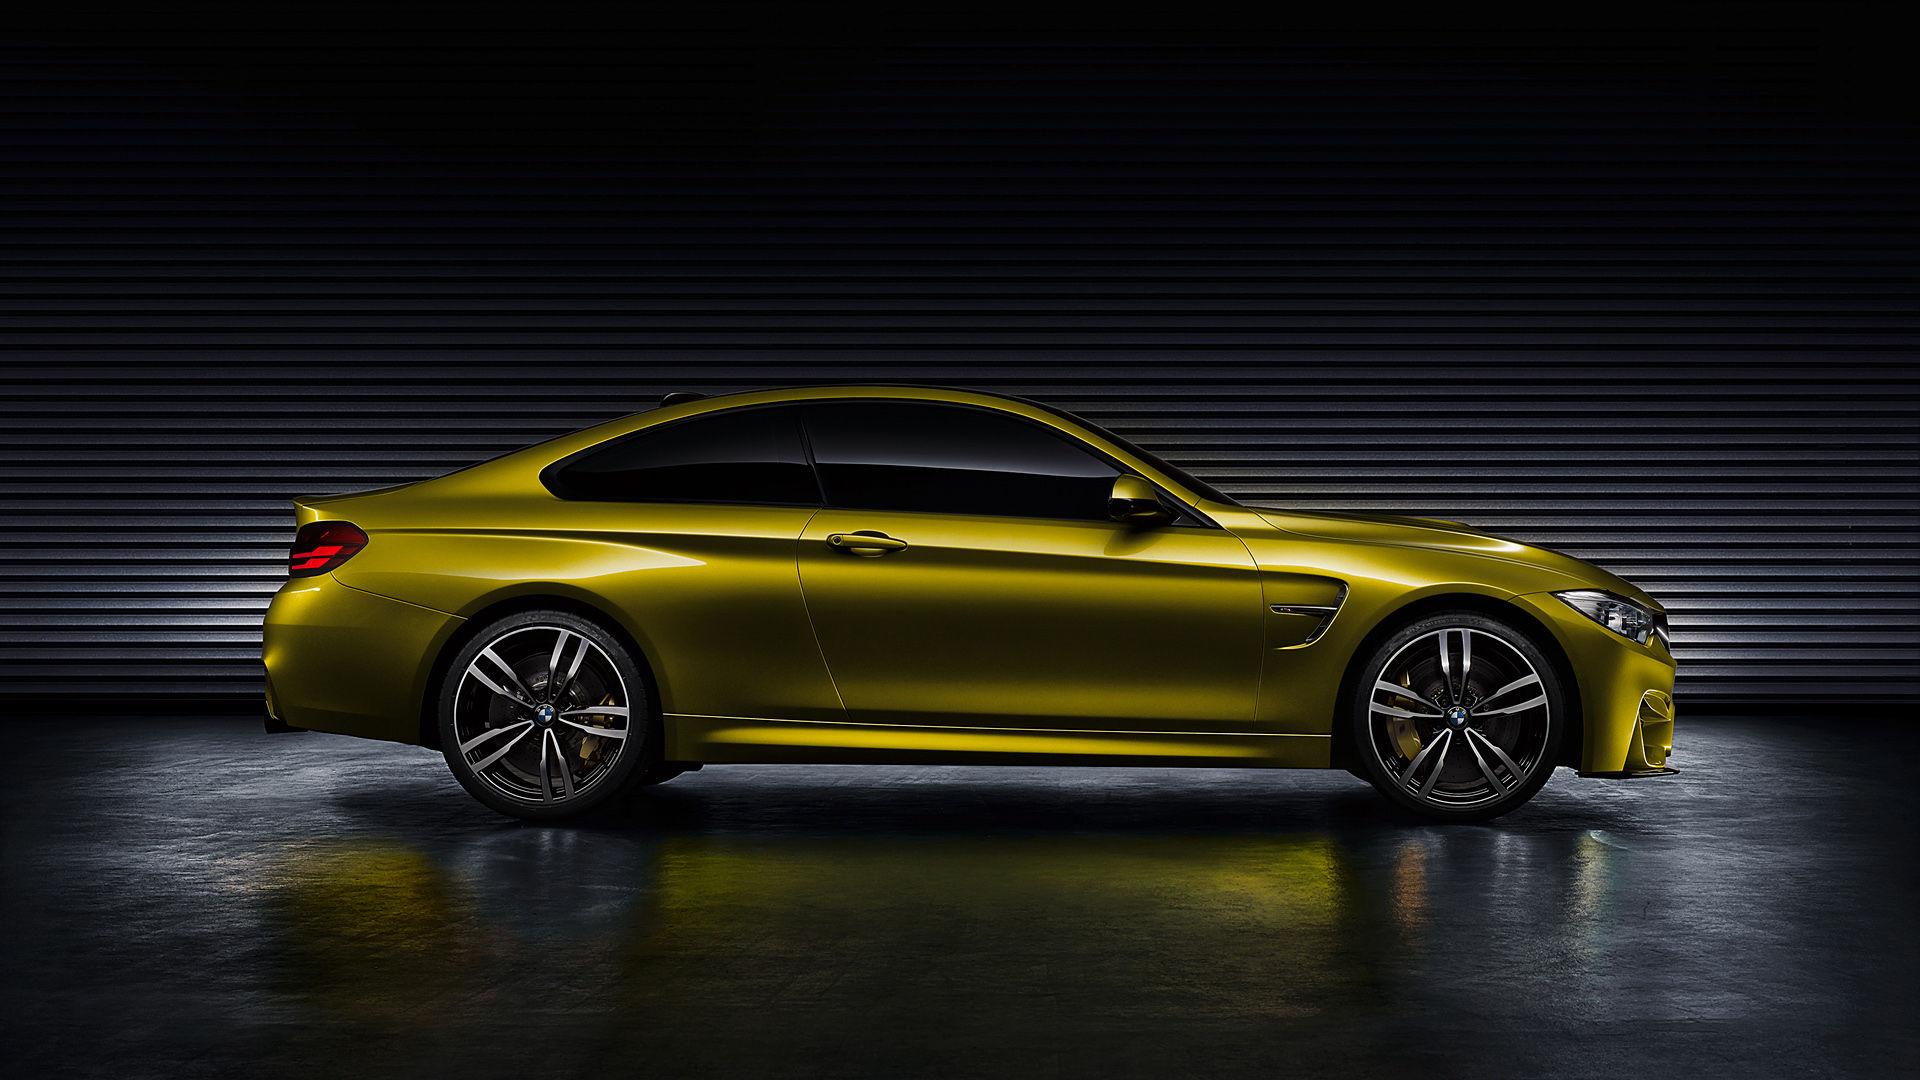 2013 BMW M4 Coupe Concept